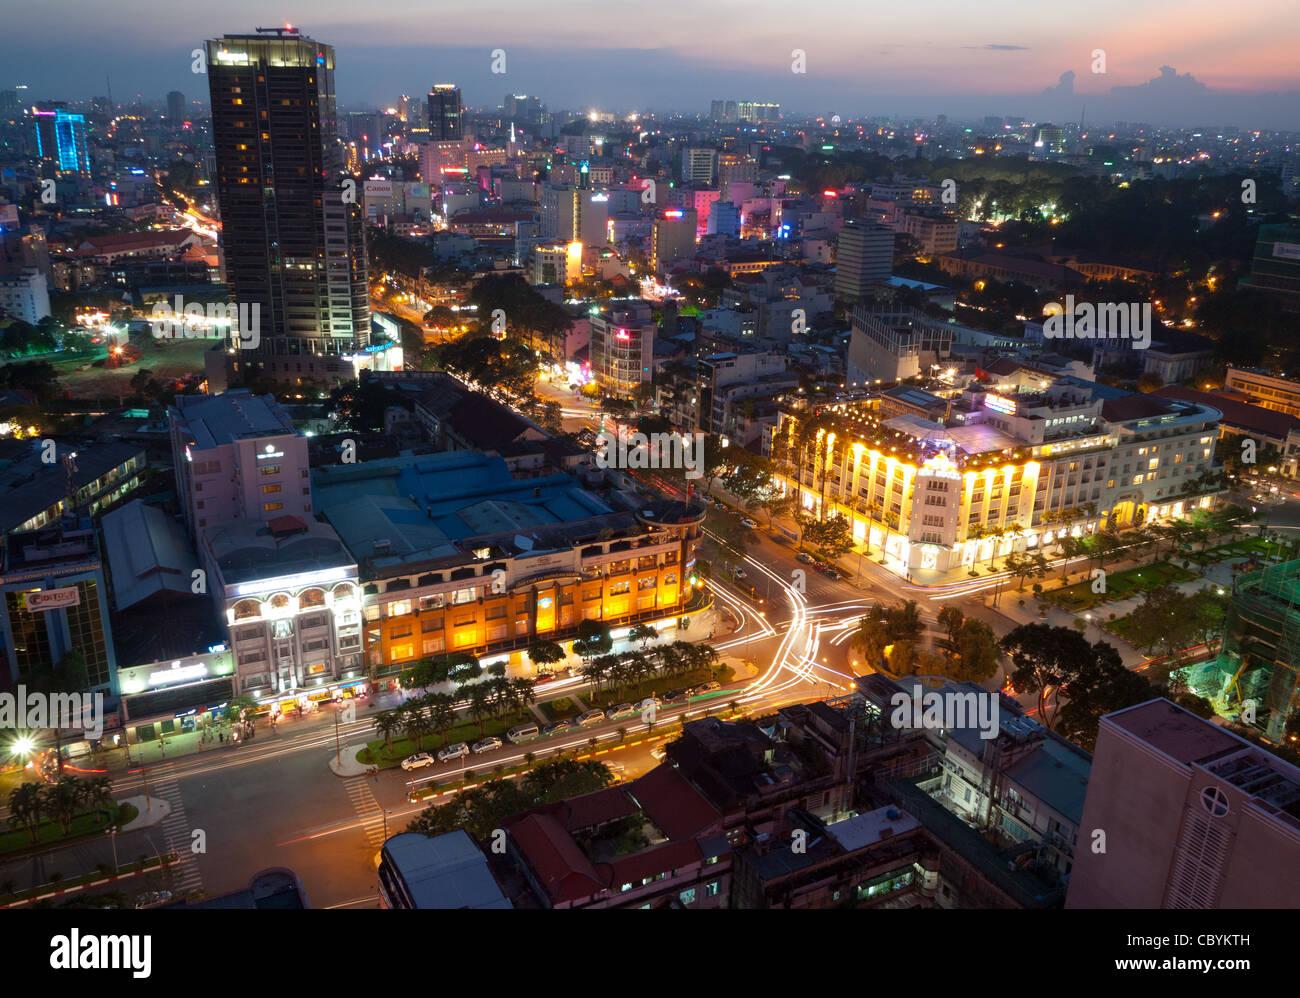 Ho Chi Minh City (Saigon), Vietnam at dusk. - Stock Image